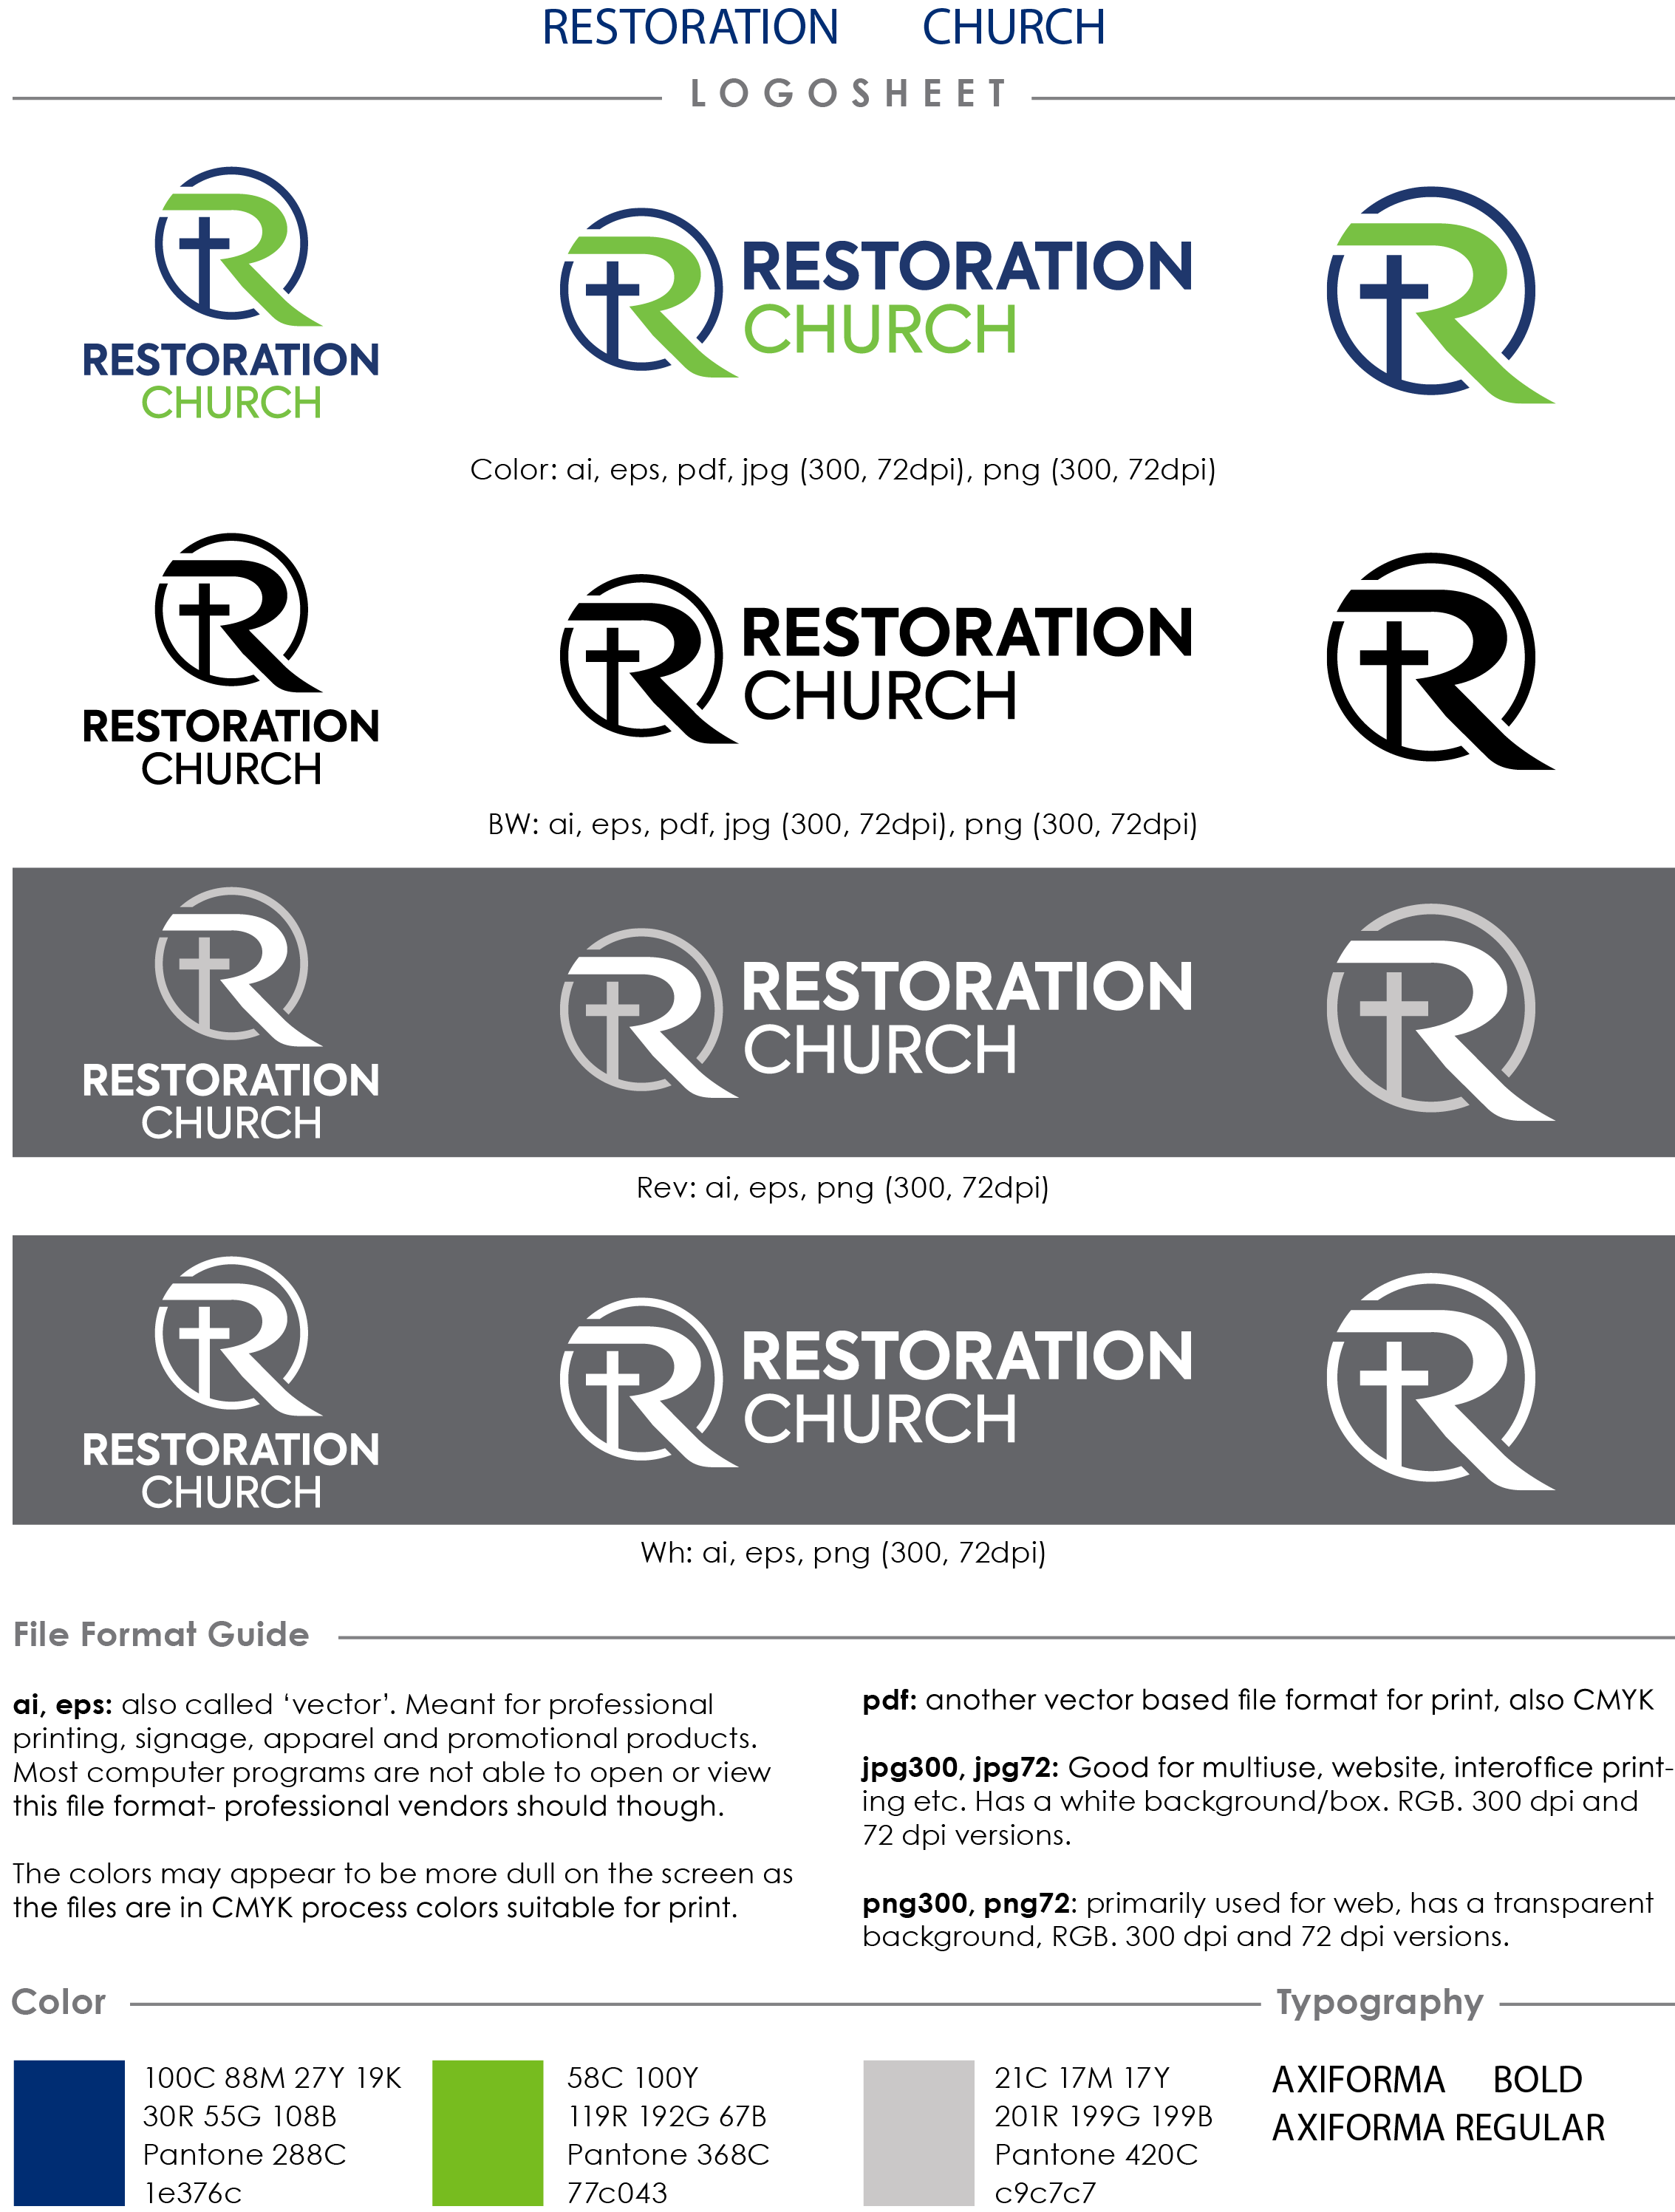 Restoration-Logosheet.png